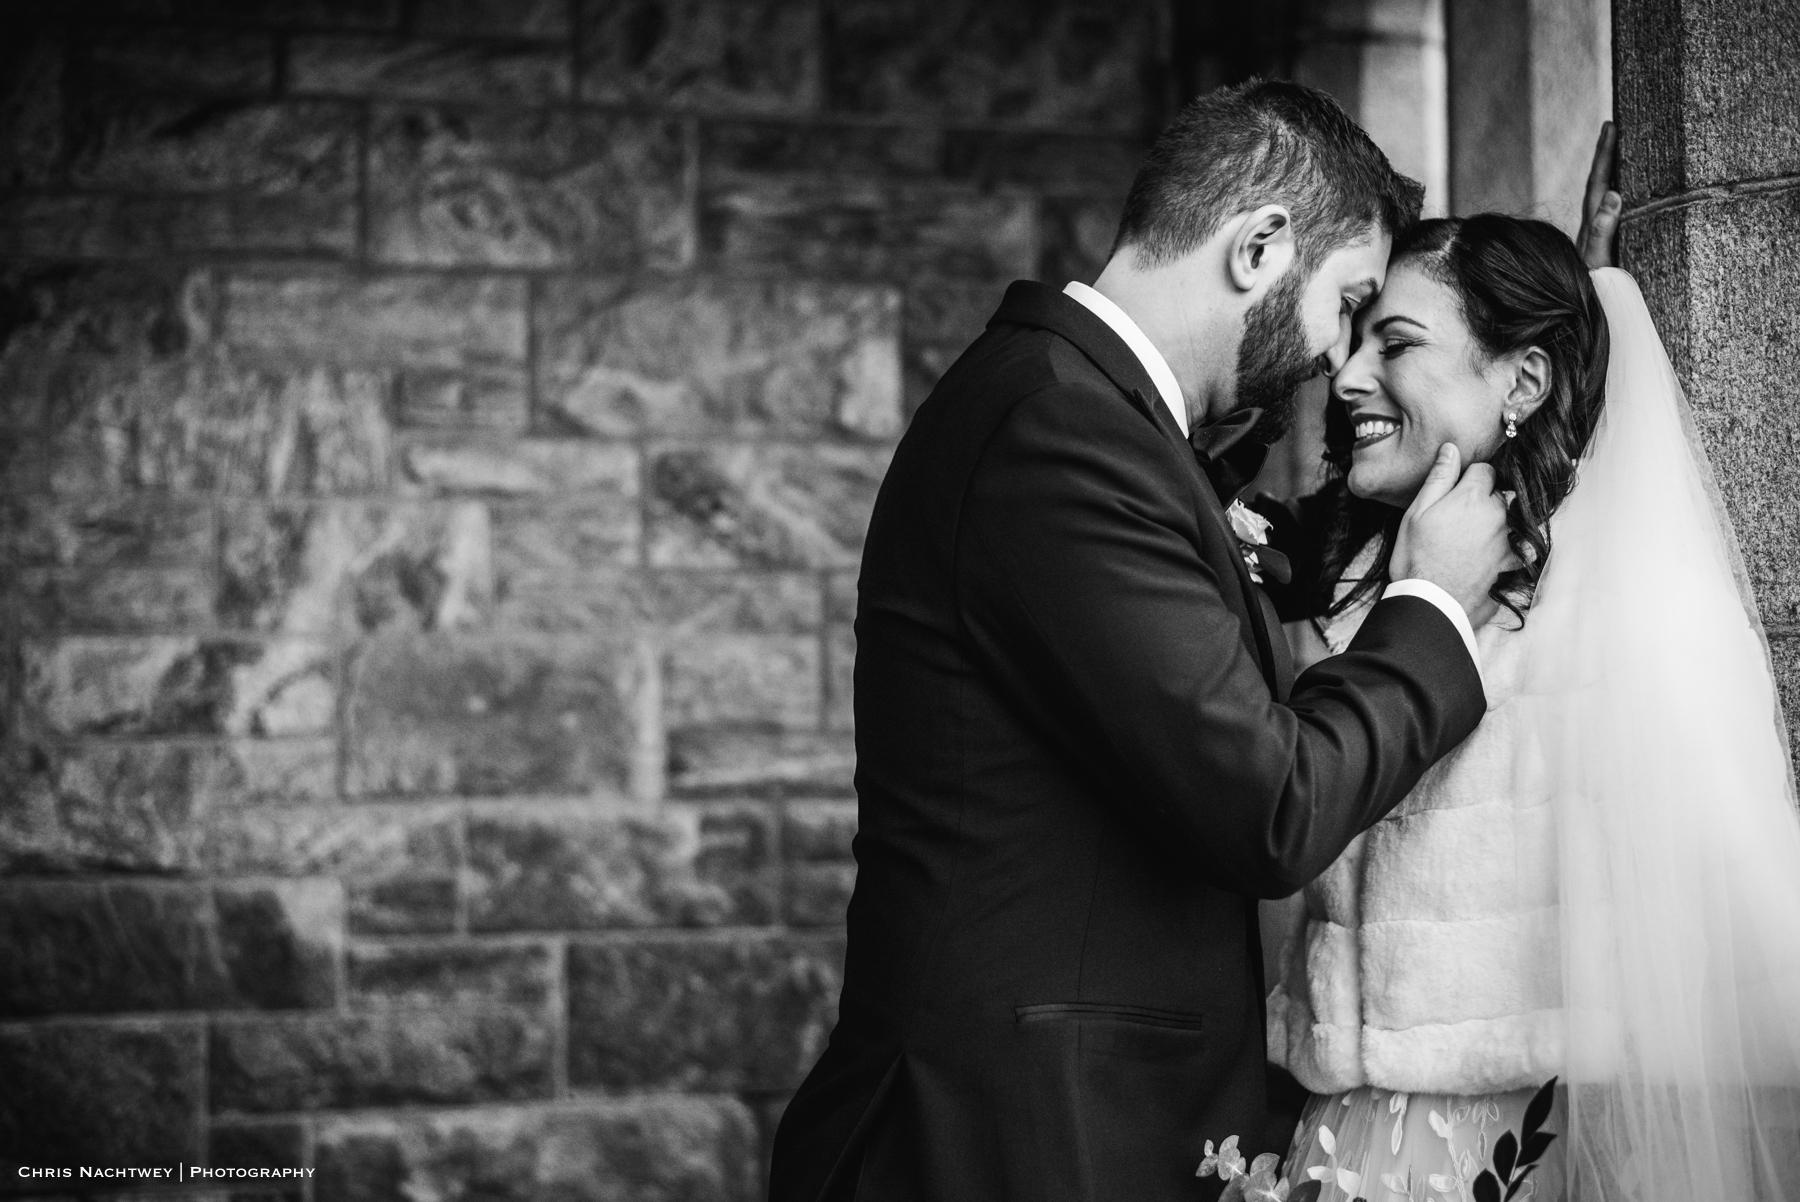 winter-branford-house-wedding-photos-groton-ct-chris-nachtwey-photography-2019-24.jpg